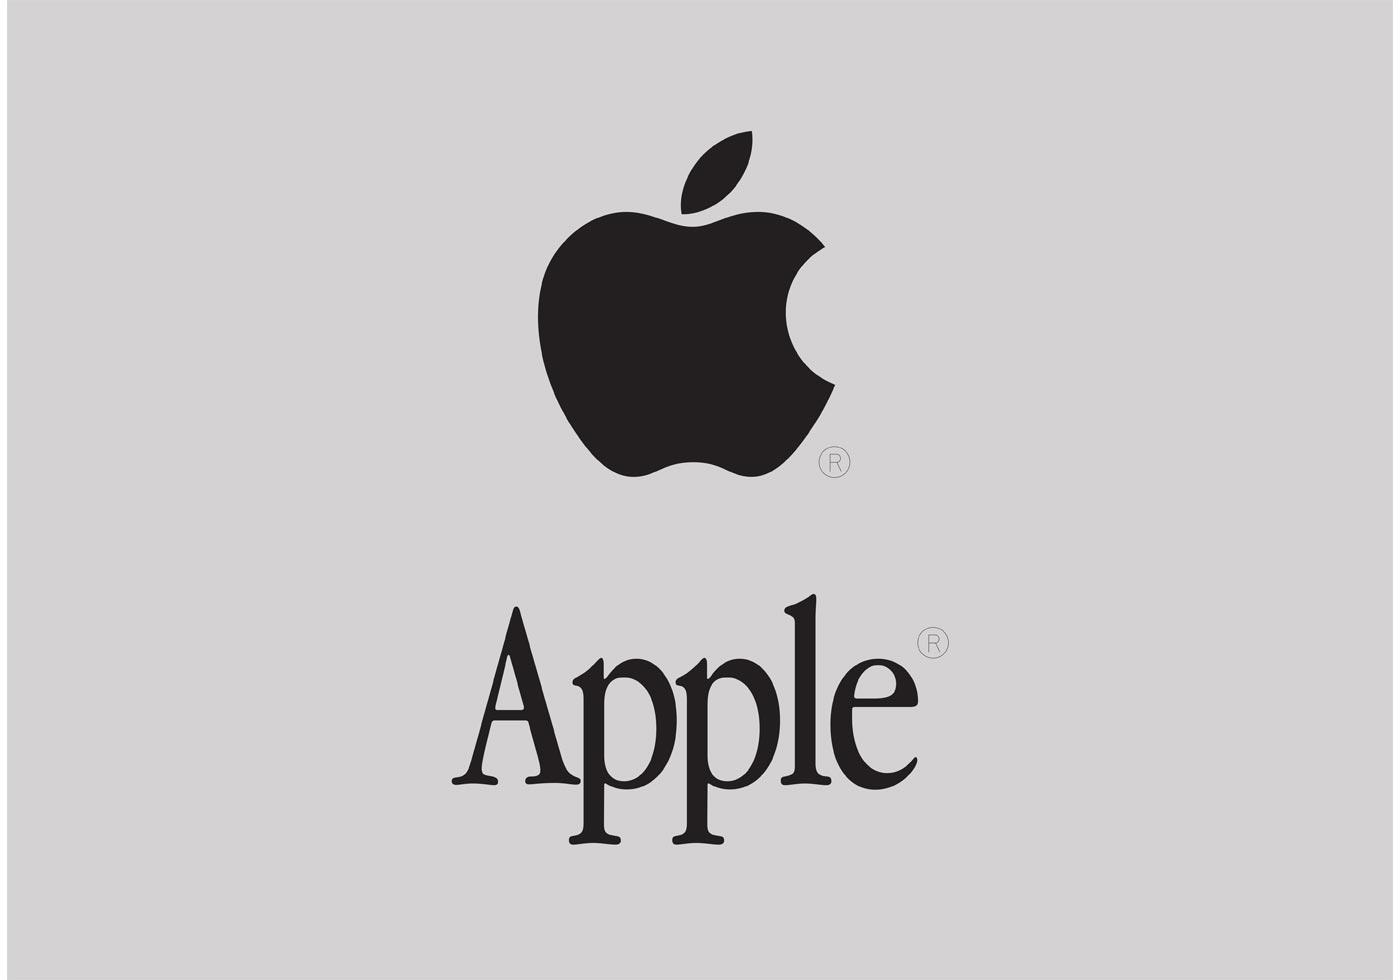 apple vector logo download free vector art stock graphics images rh vecteezy com apple logo vector format apple logo vector format